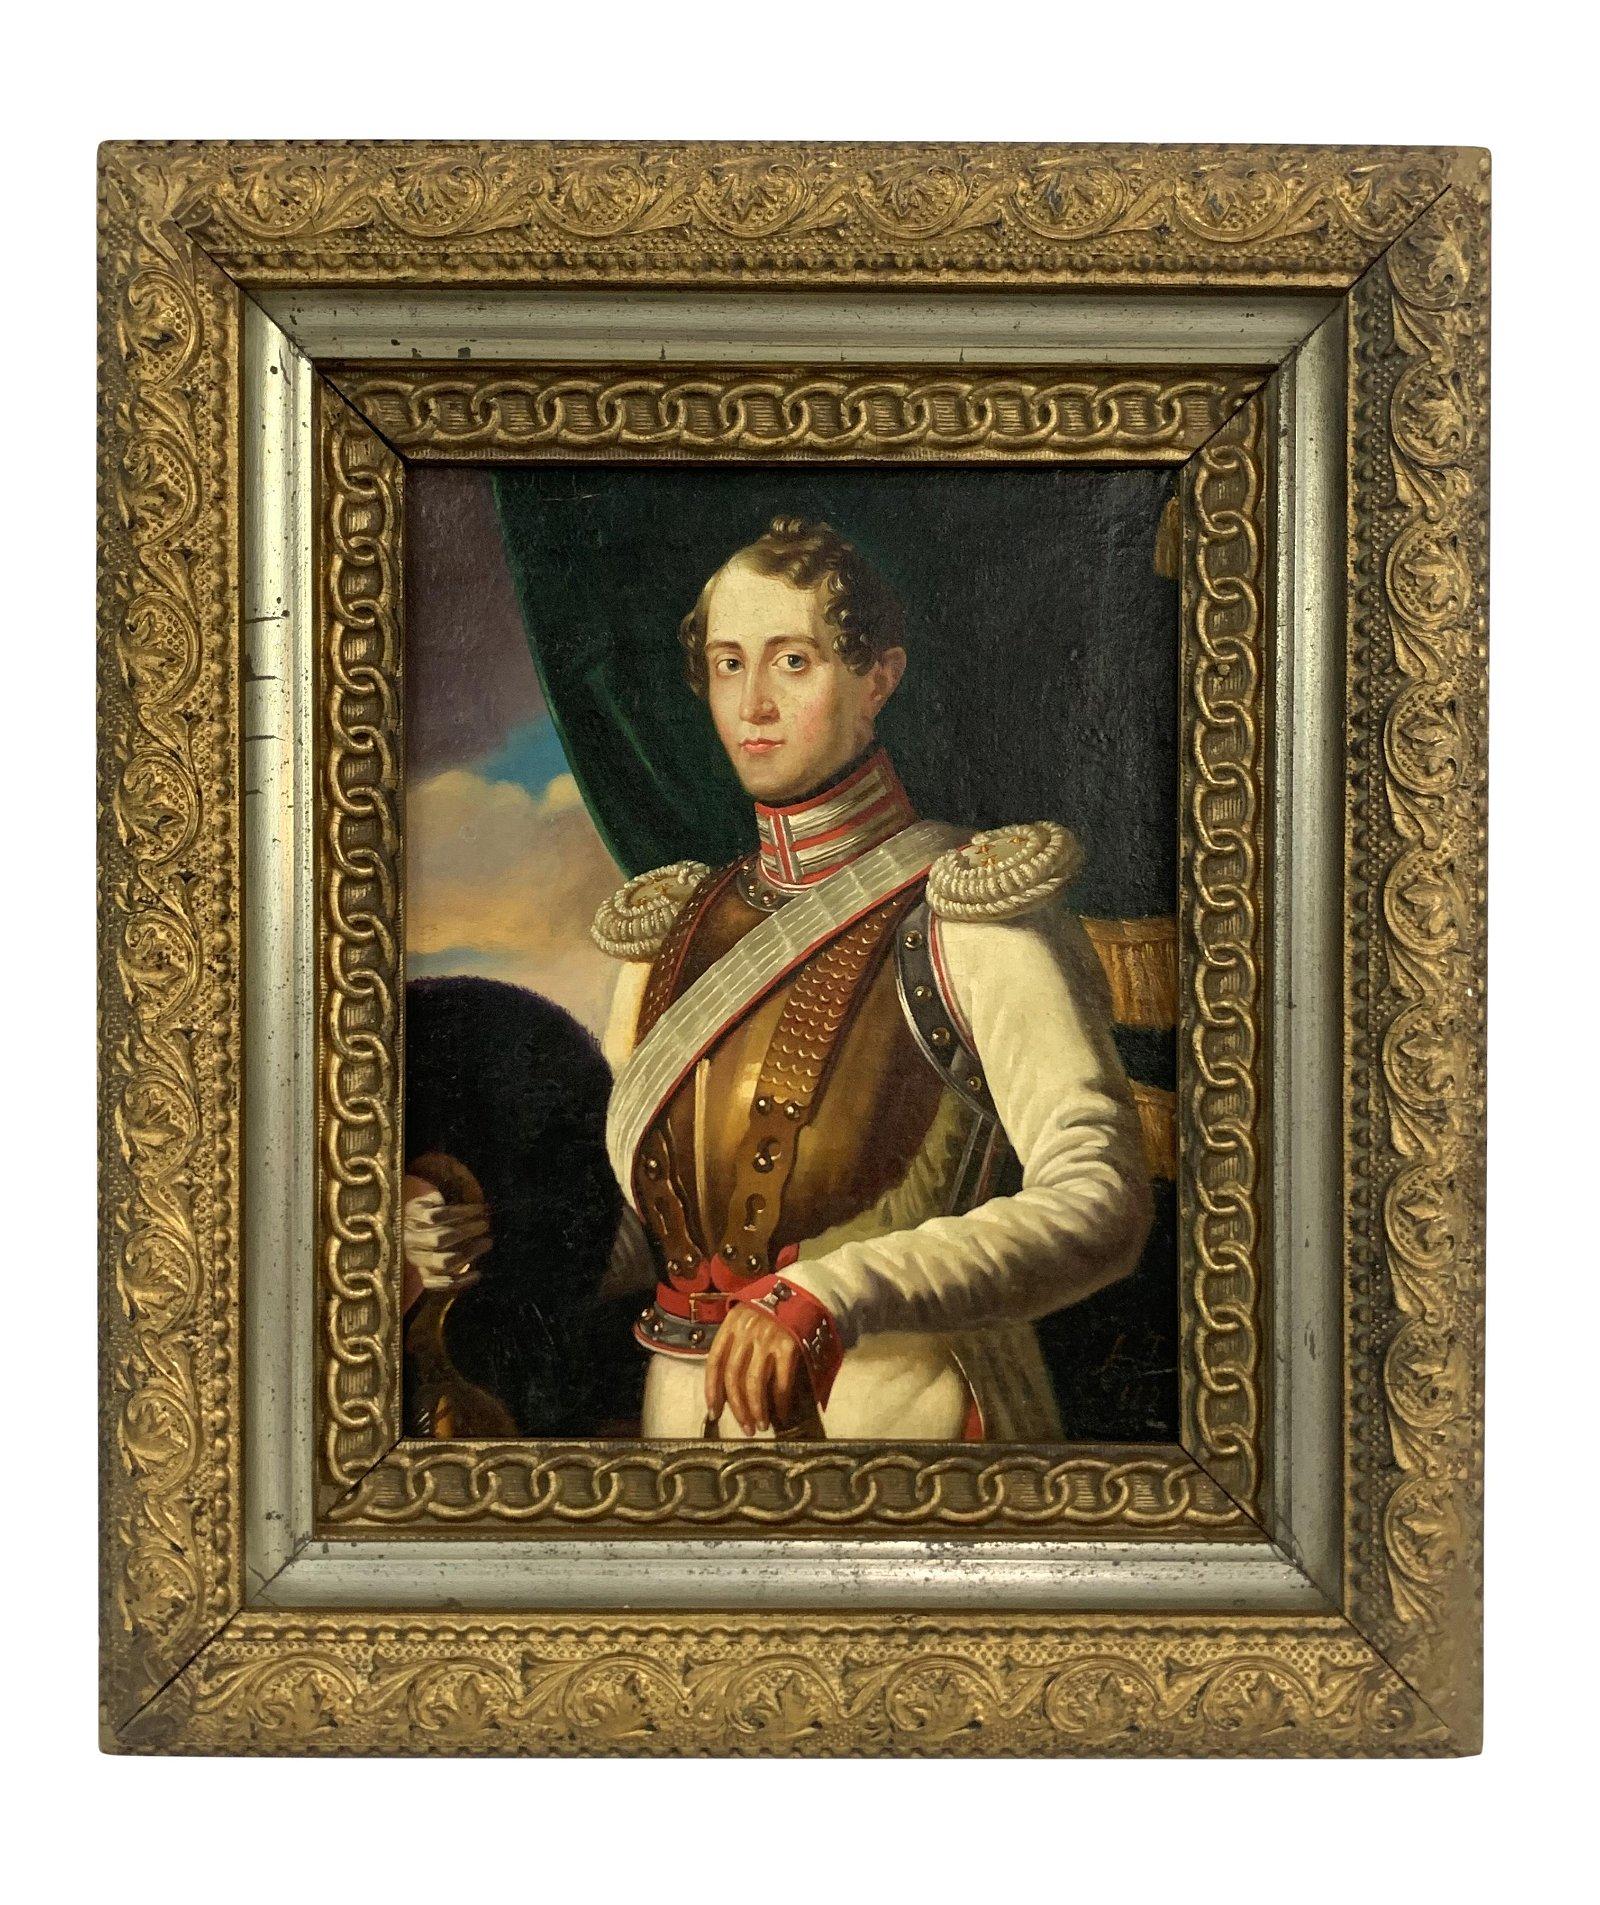 Antique Russian Officer Arapov Portrait Painting